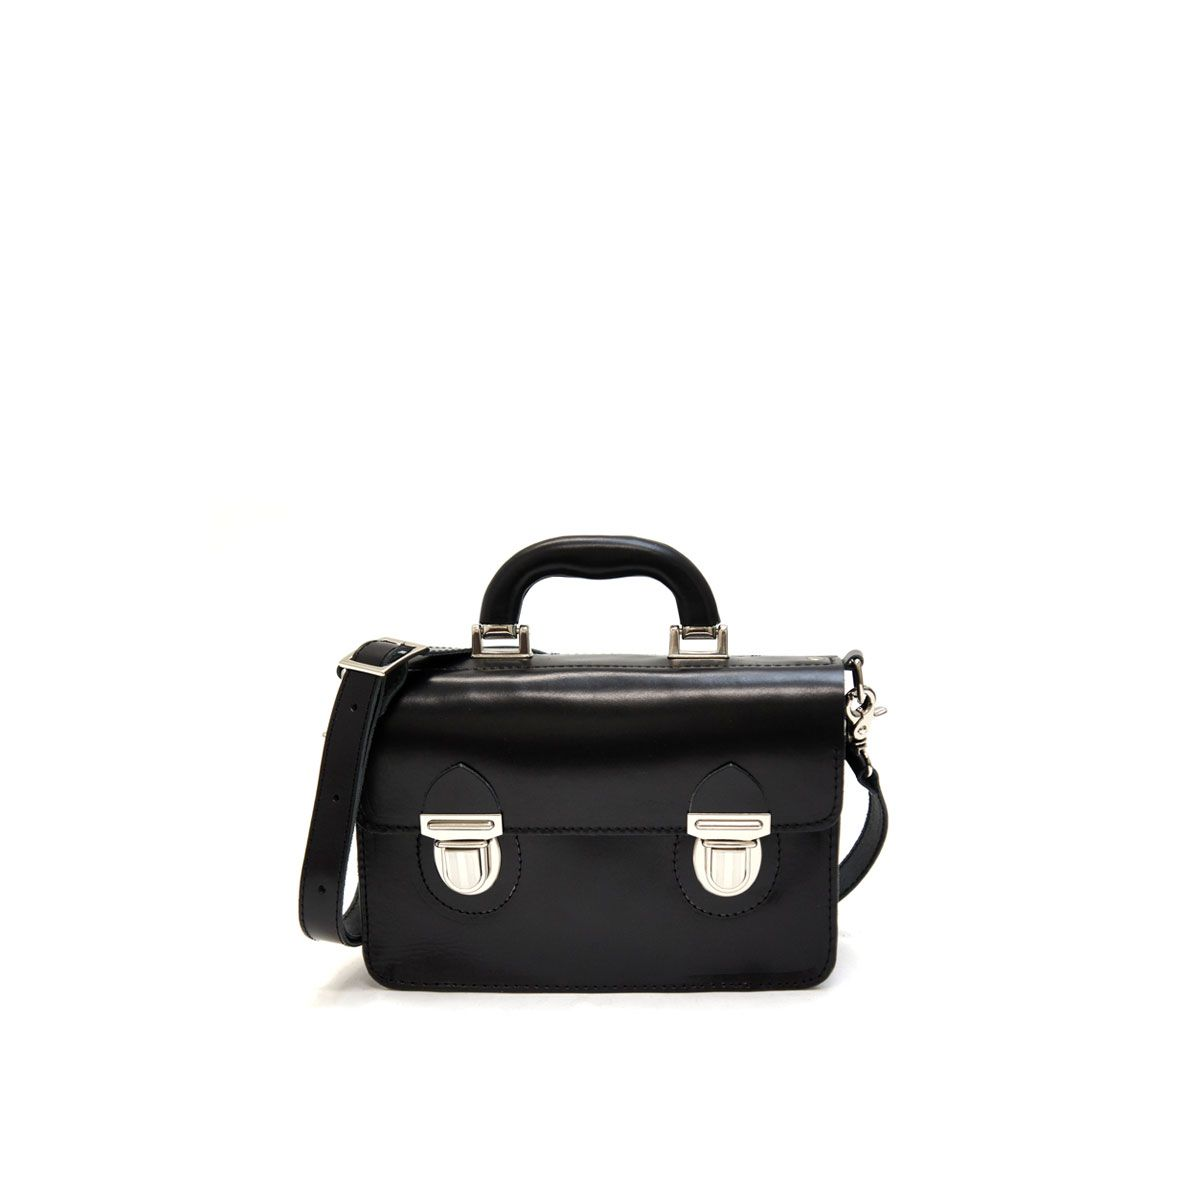 e0caa08ed9fa9 Miki Small Postman Bag Black | Lumi Accessories | // B A G S ...